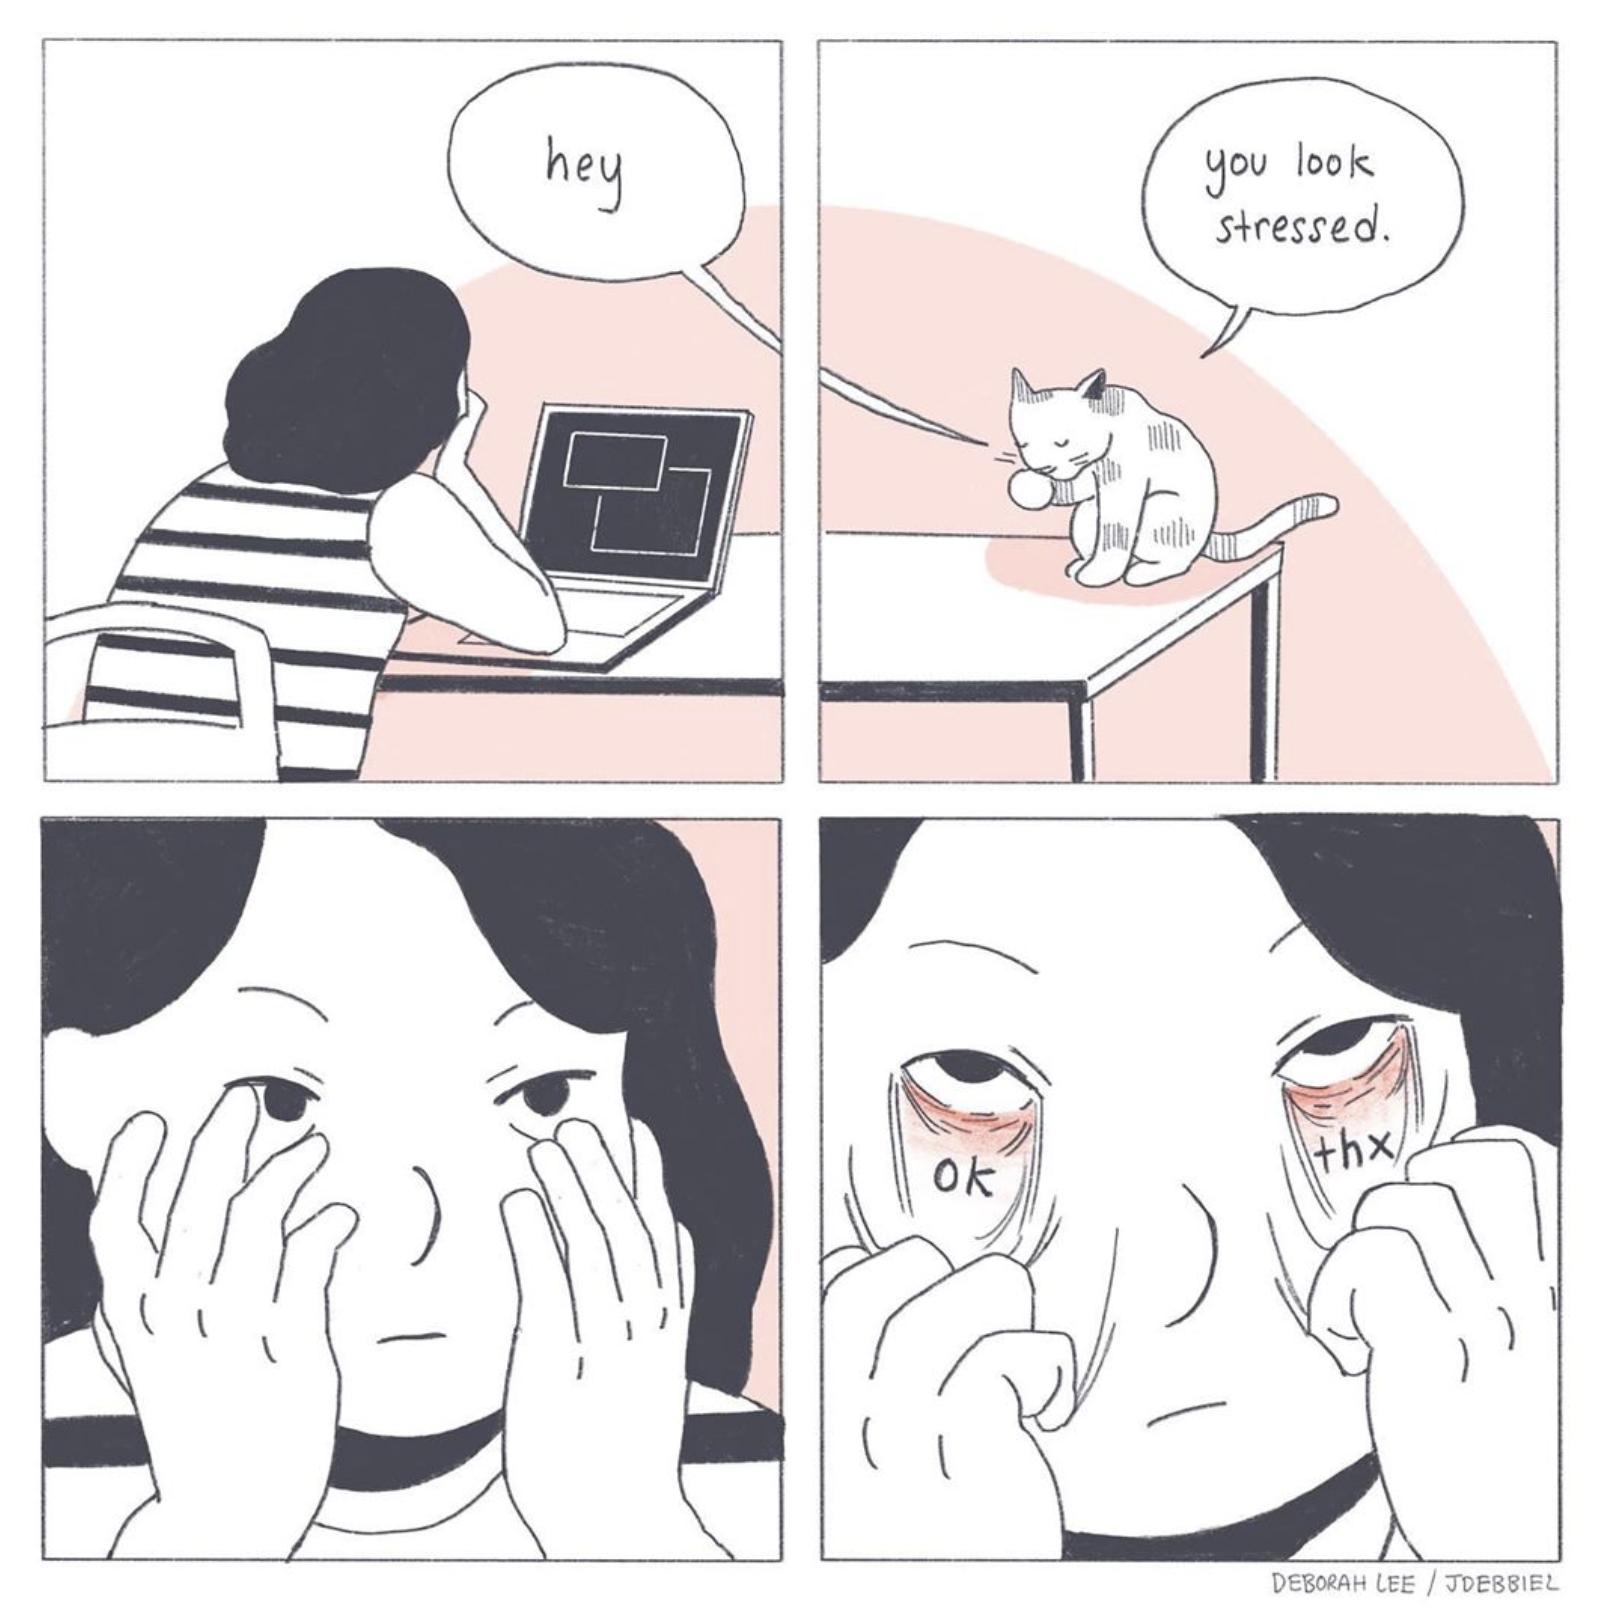 DL_stressed